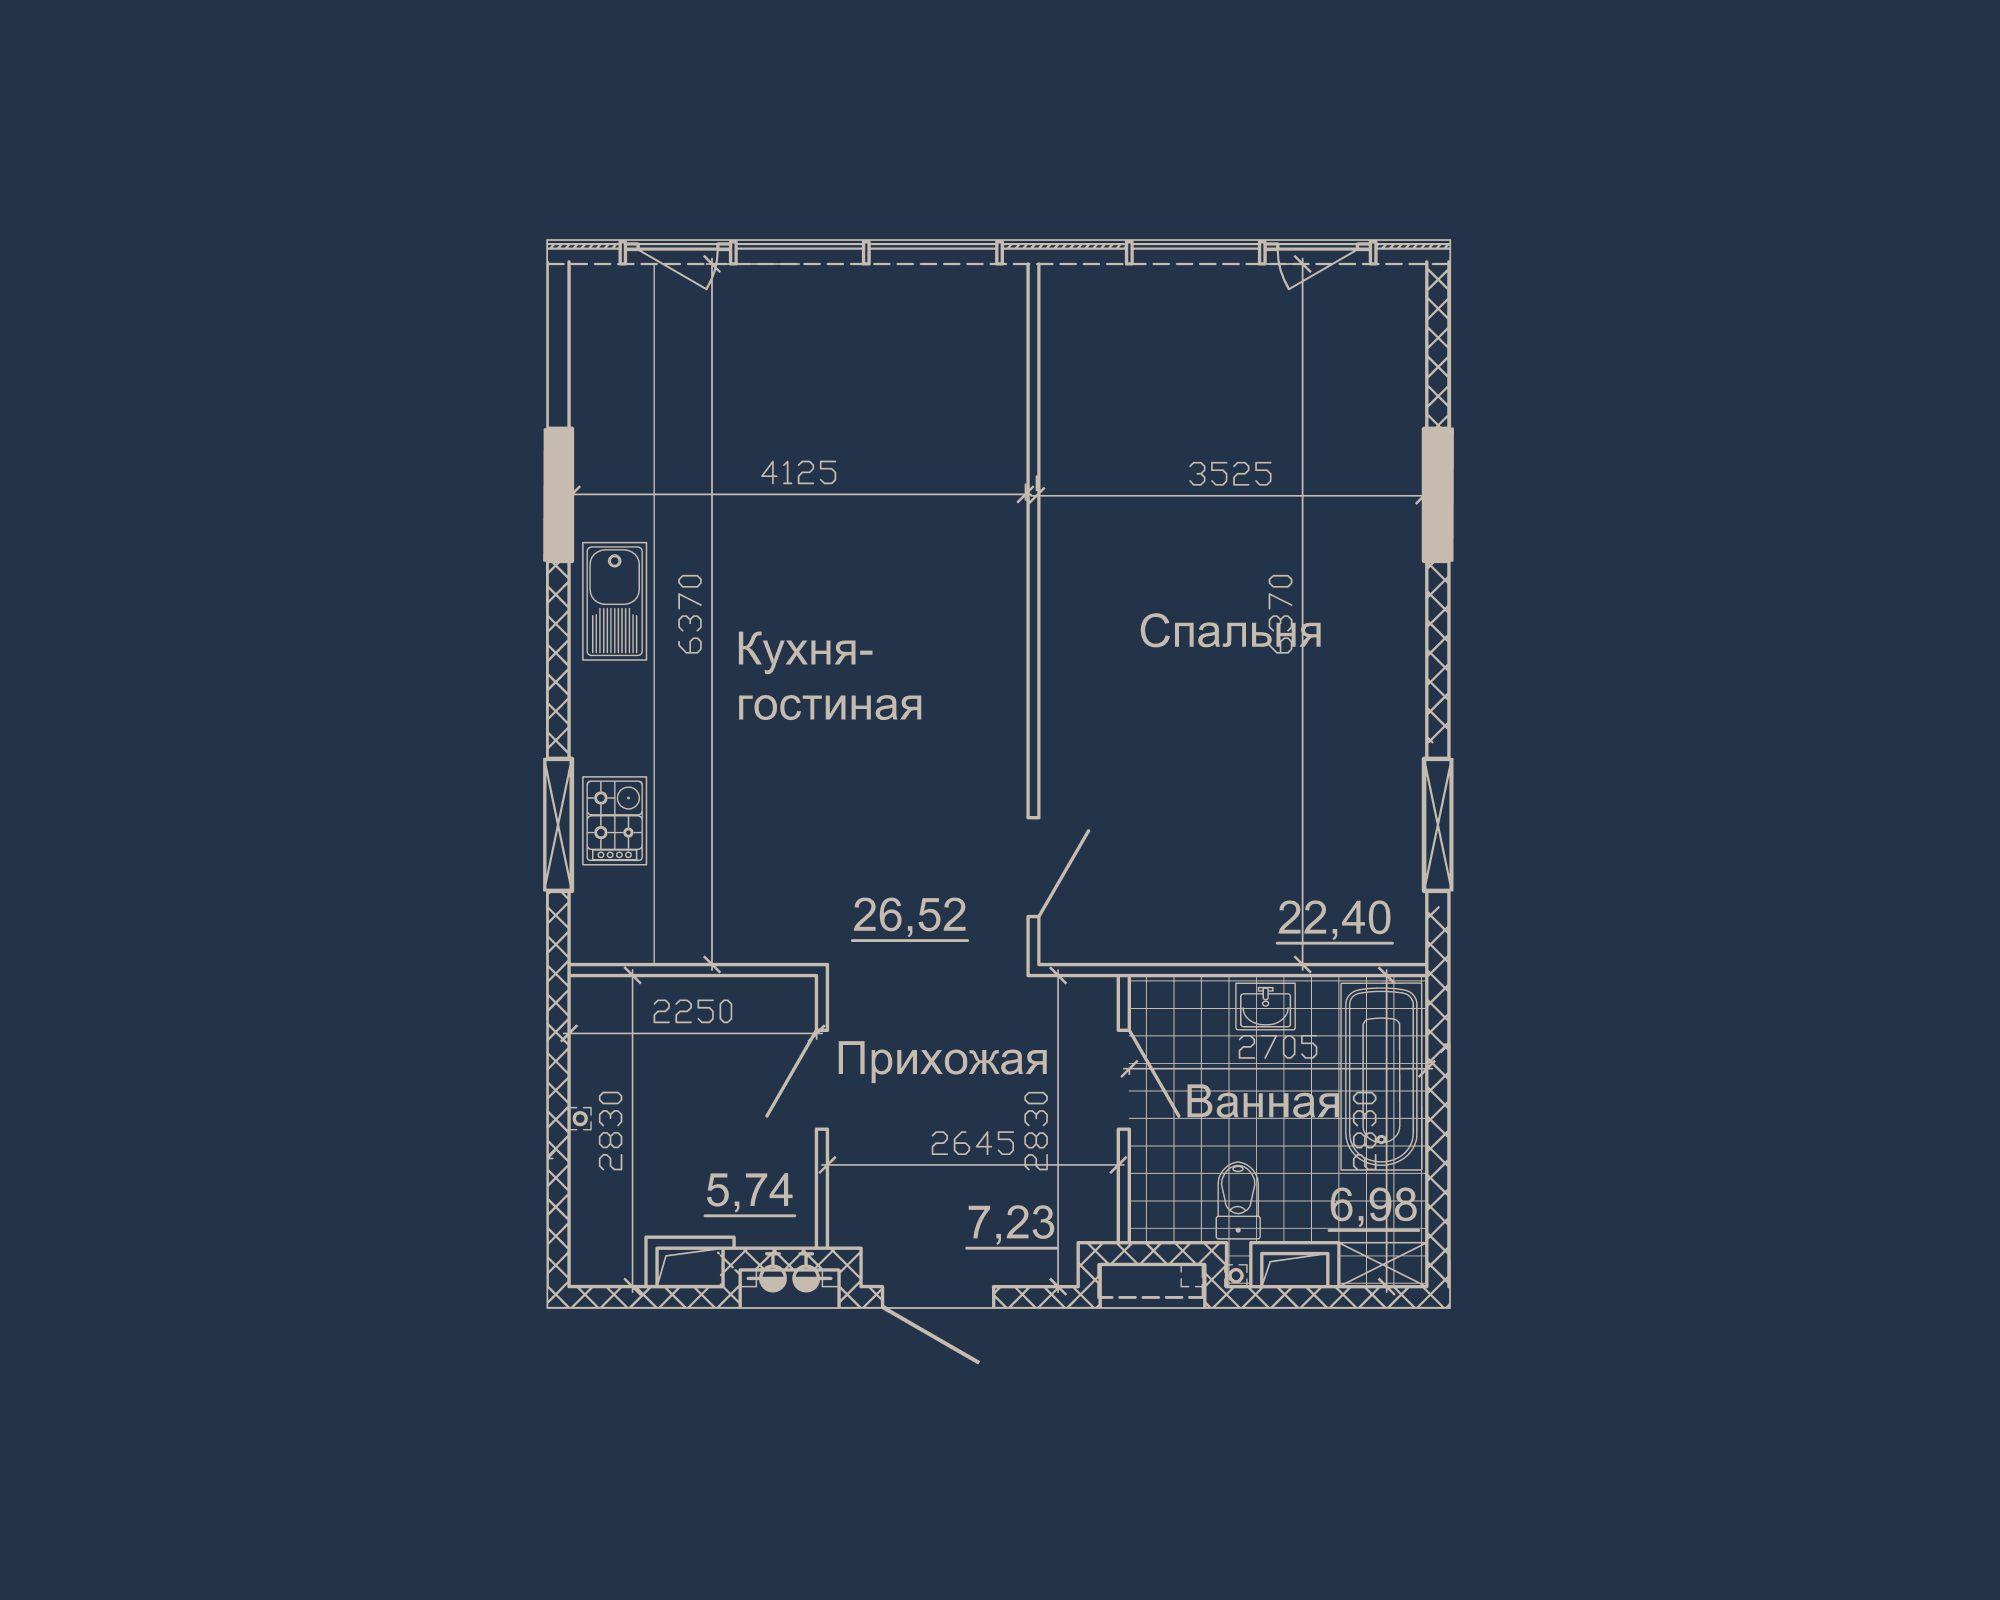 1-кімнатна квартира типу 02А-1 у ЖК Nebo